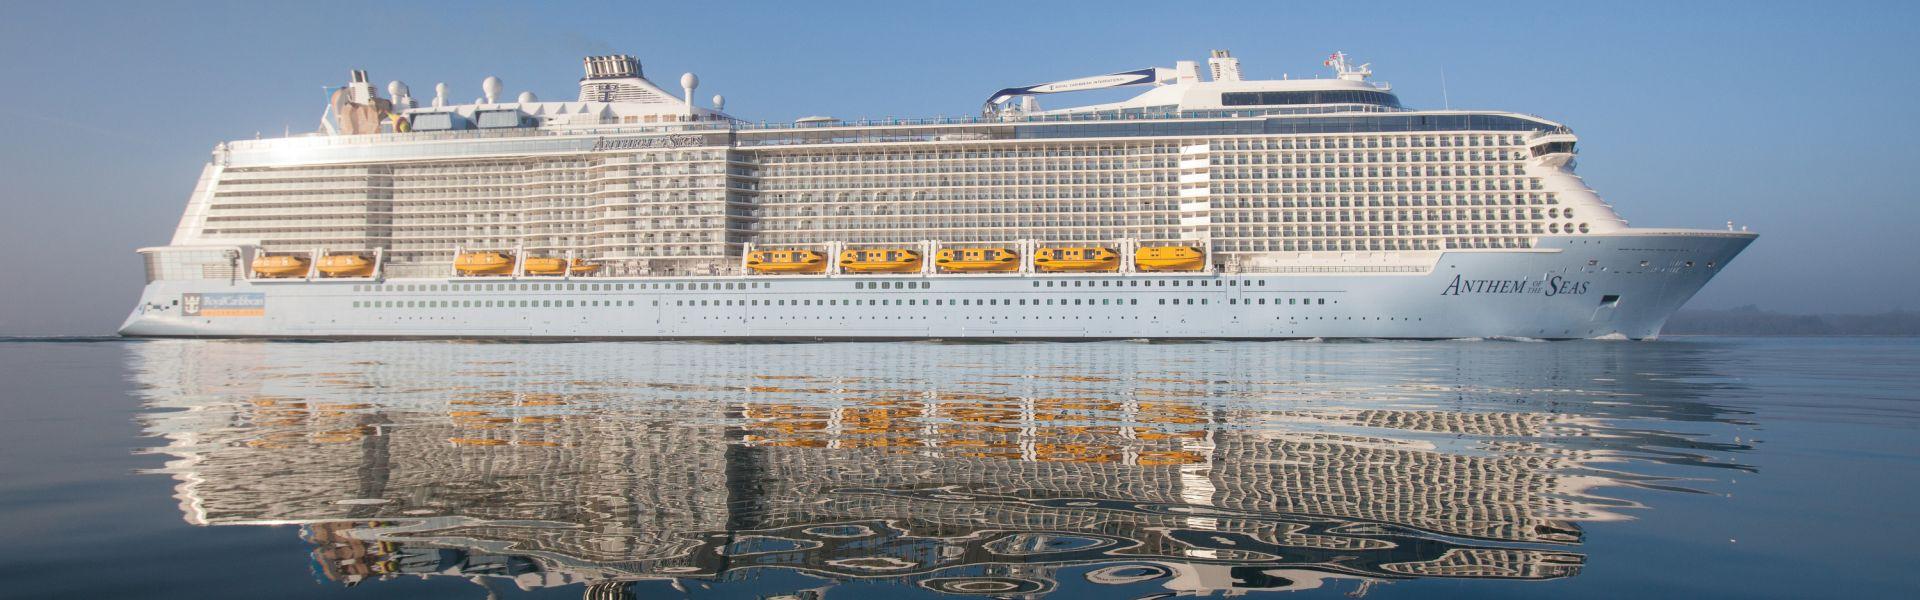 Croaziera 2017 - Caraibe/Bahamas (Bayonne) - Royal Caribbean Cruise Line - Anthem of the Seas - 7 nopti